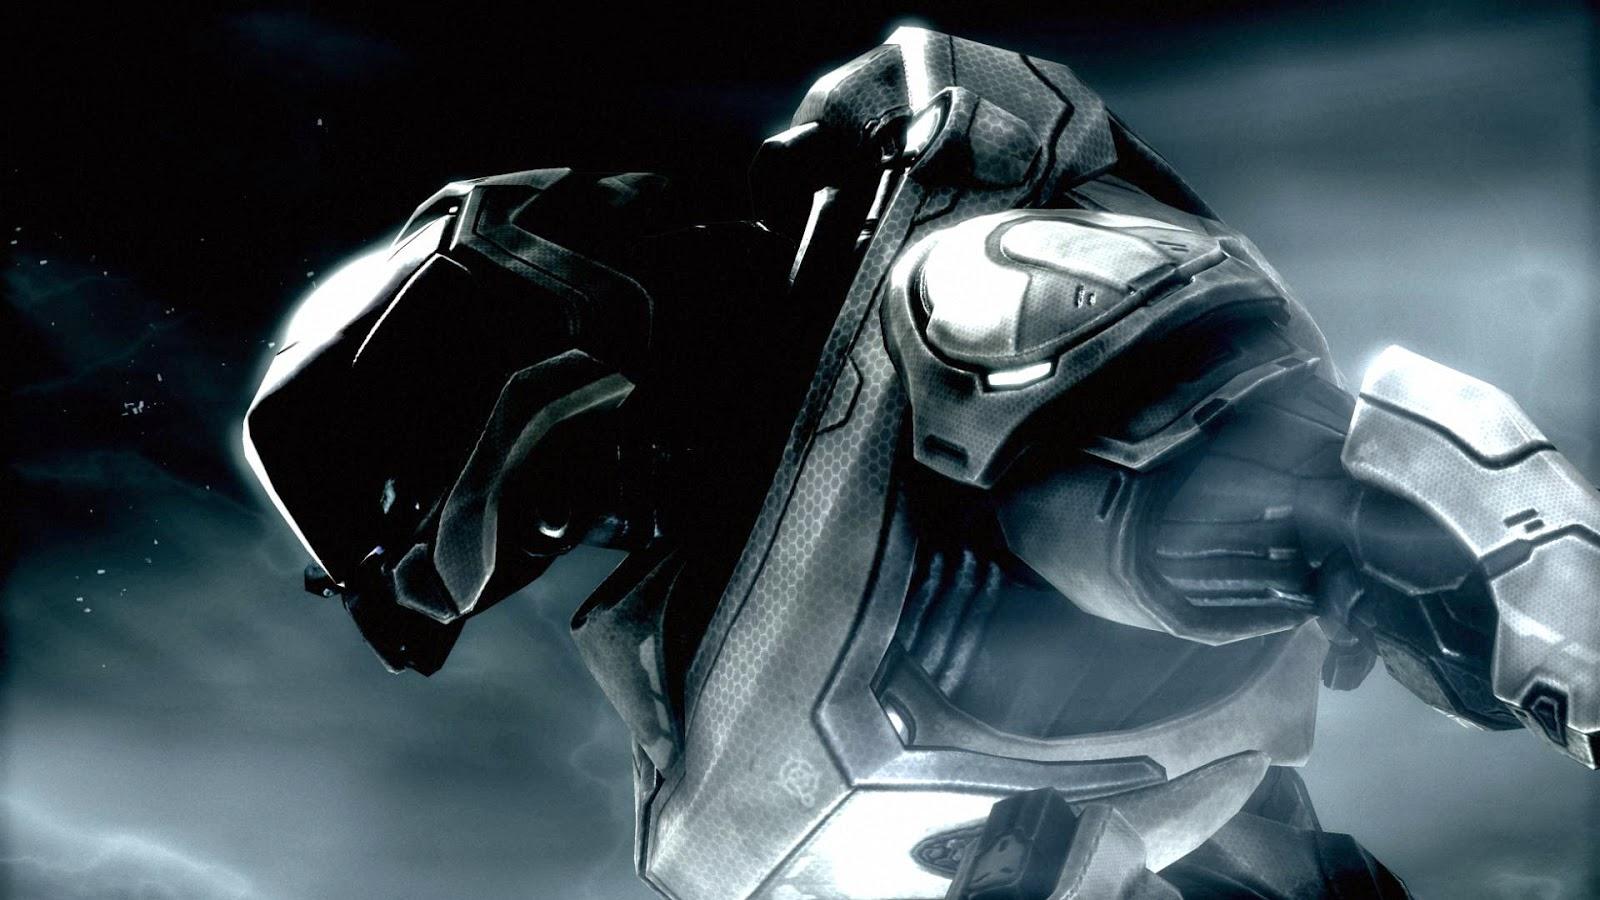 Halo Halo 5 Master Chief 1600x900